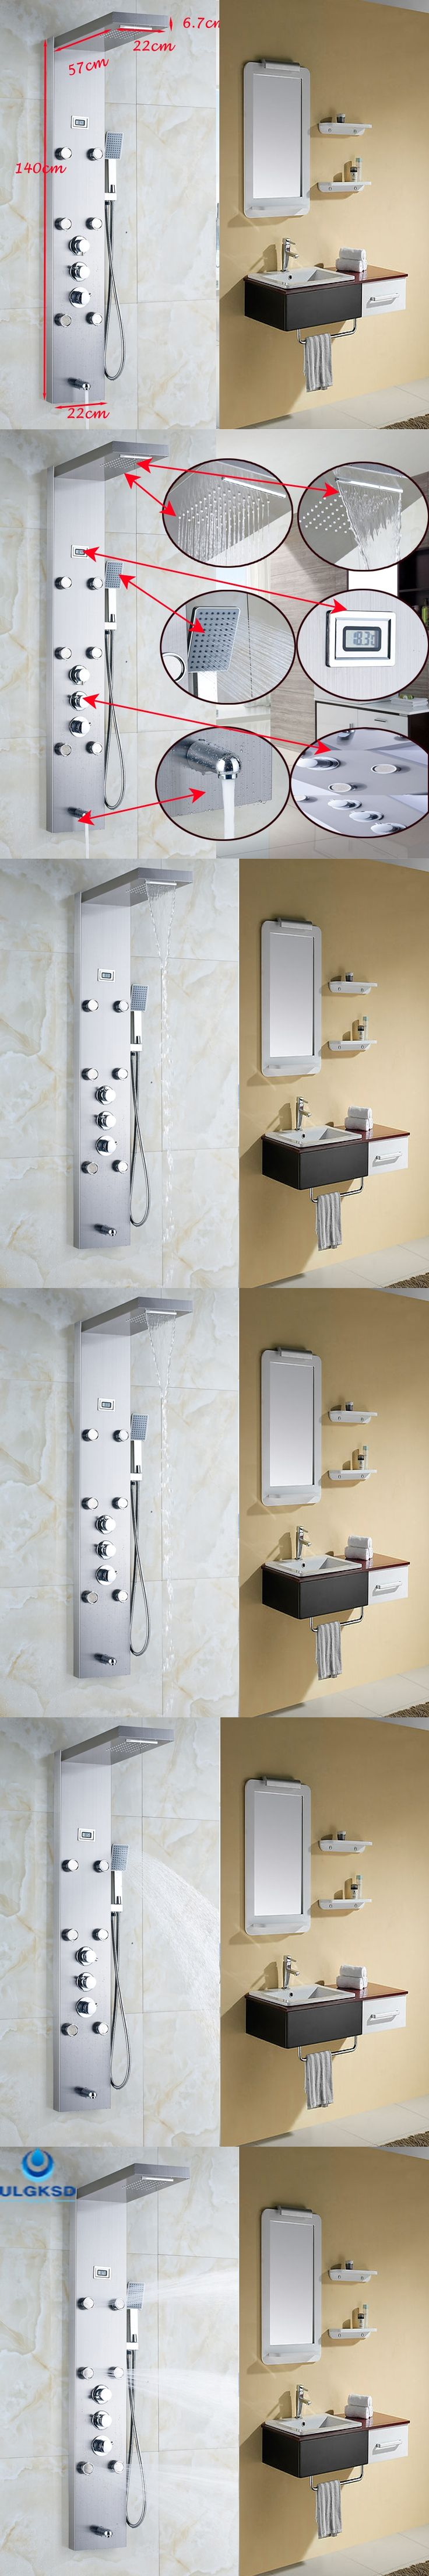 Ulgksd Thermostatic Shower Faucet Jets Bathroom Waterfall Rain Shower Column 6 pcs Massage Tub FaucetFilter Hand  Shower Panel